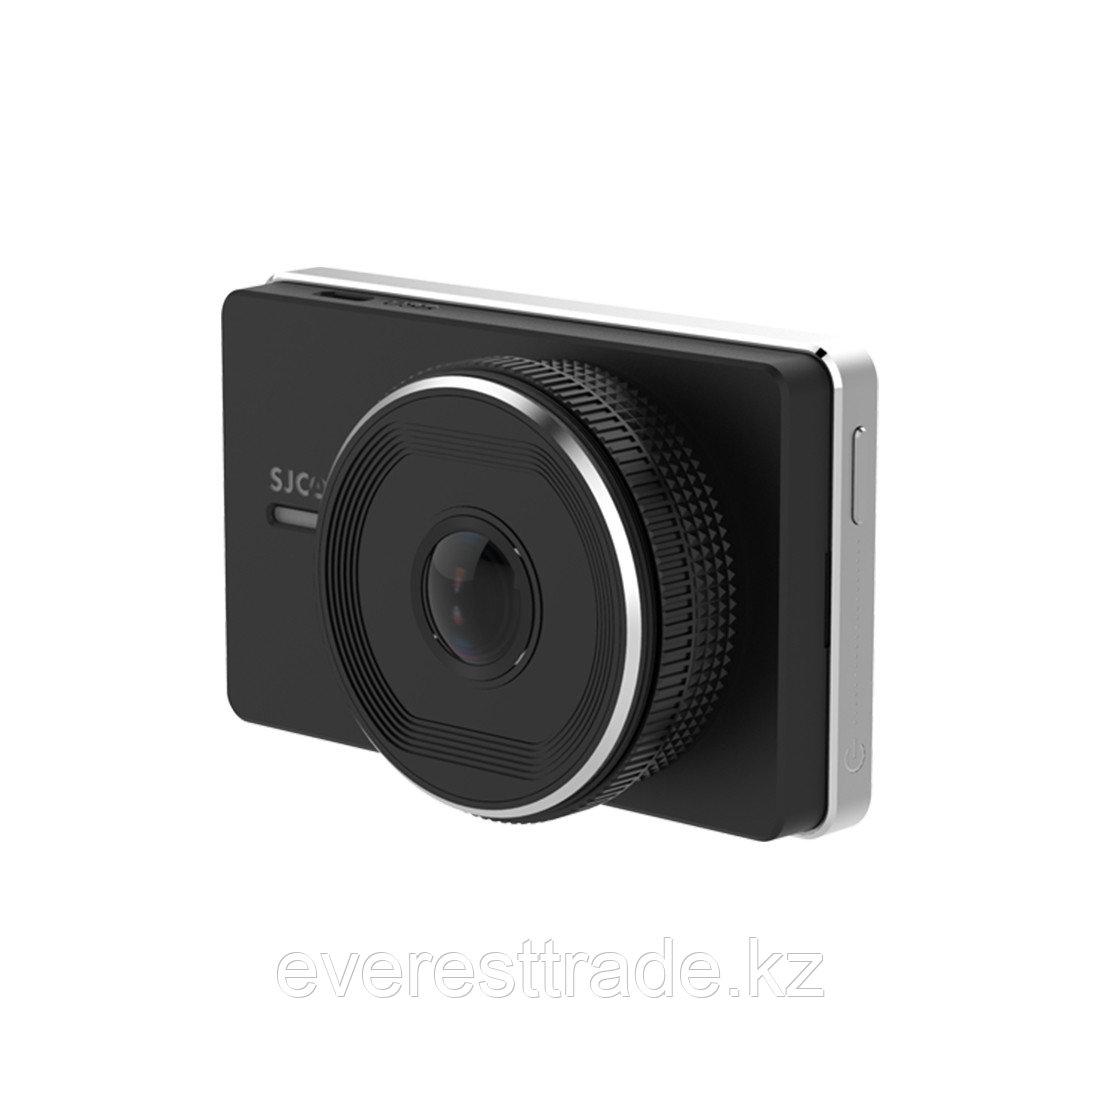 SJCAM Видеорегистратор SJCAM SJDASH Novatek 96658, SONY IMX323, 3.0''16:9 wide screen, G-Sensor support